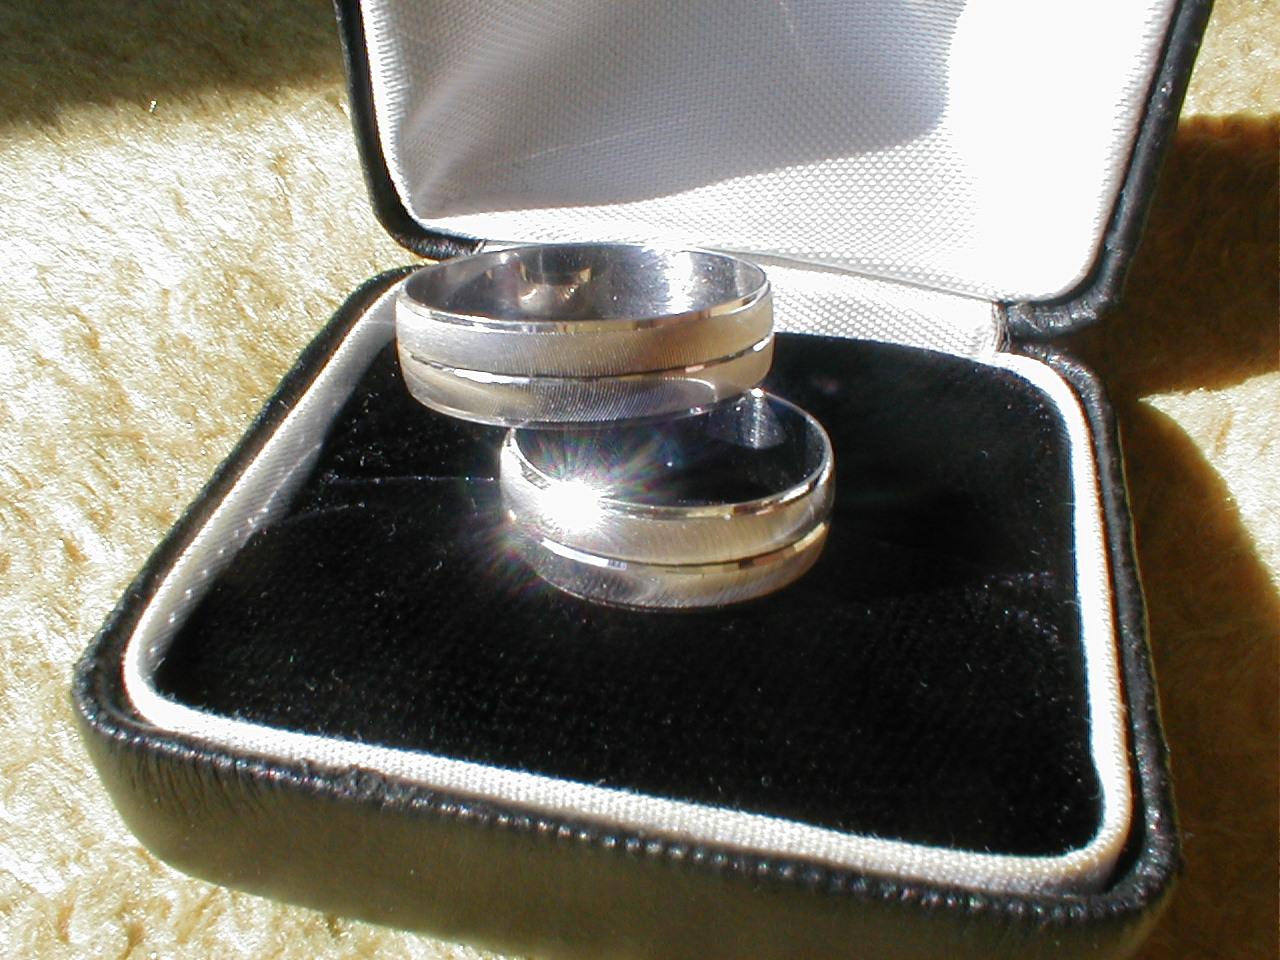 dario wedding rings juwel precious metal wedding box case reflection hilite highlite